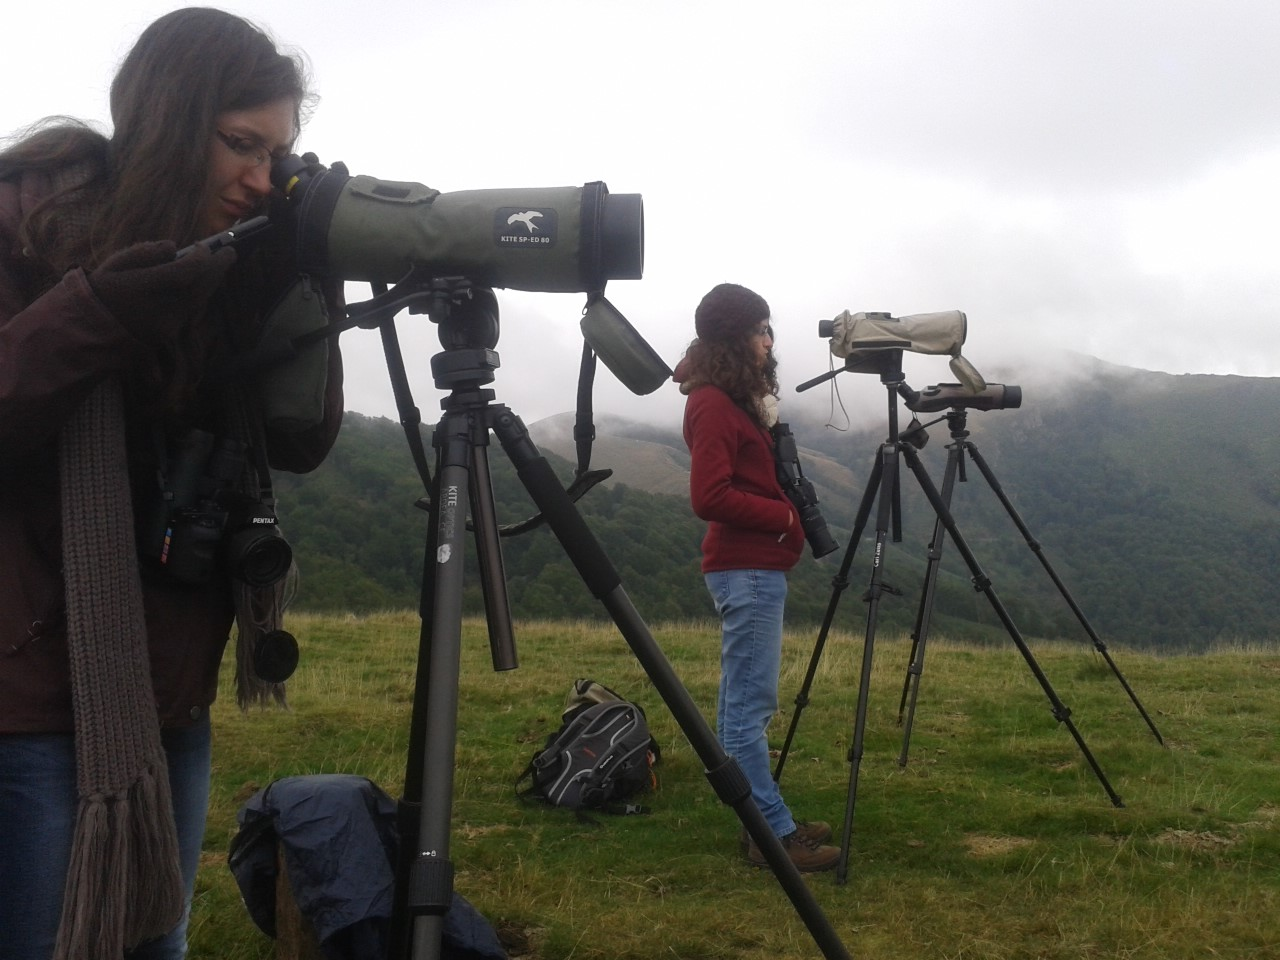 Matériel d'observation de terrain